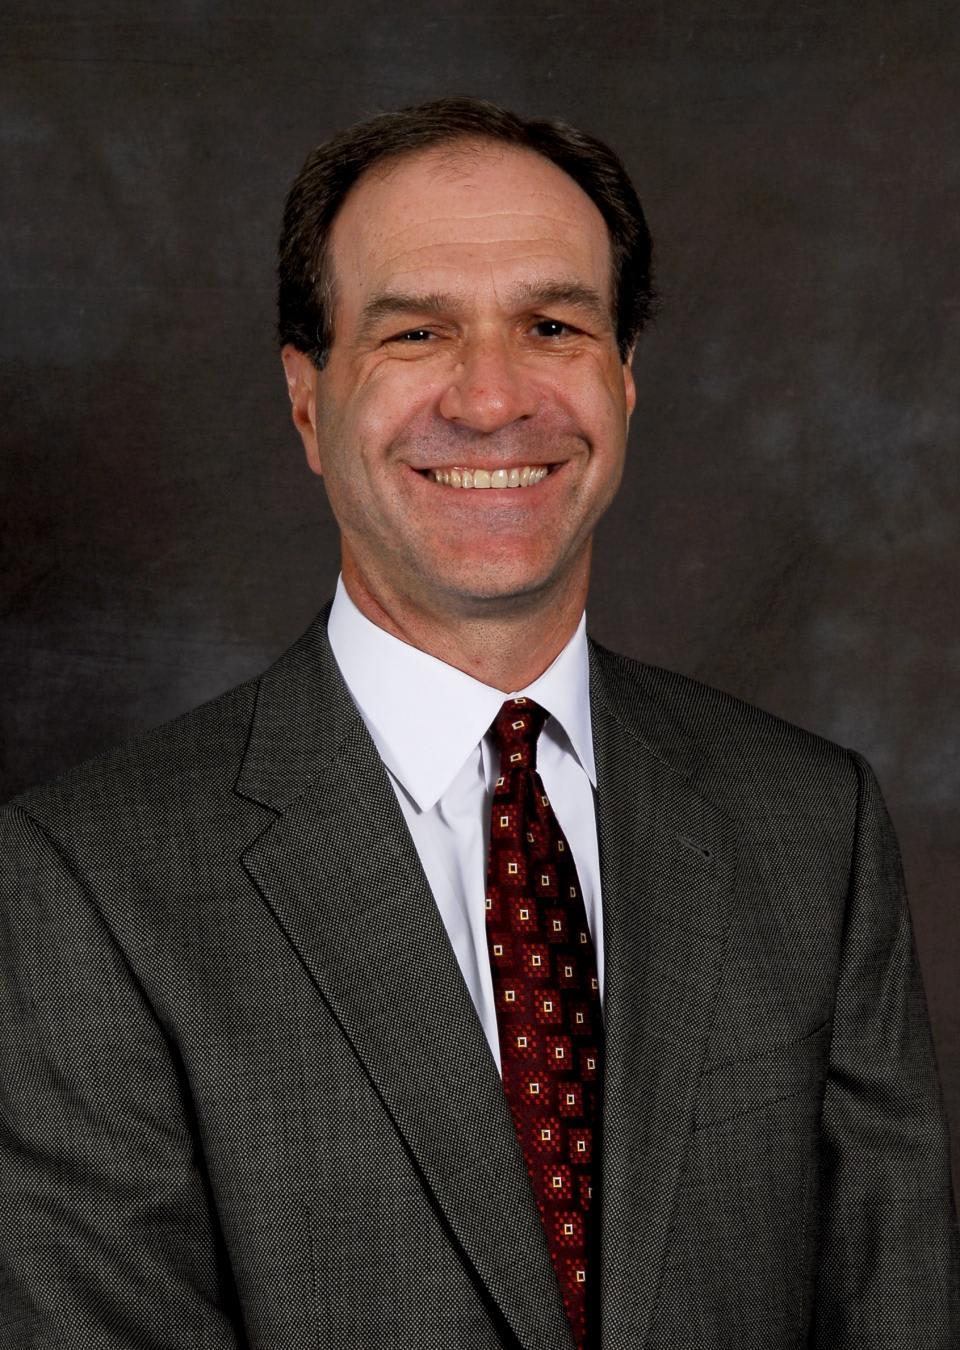 Dr. Pasquale Petrera MD